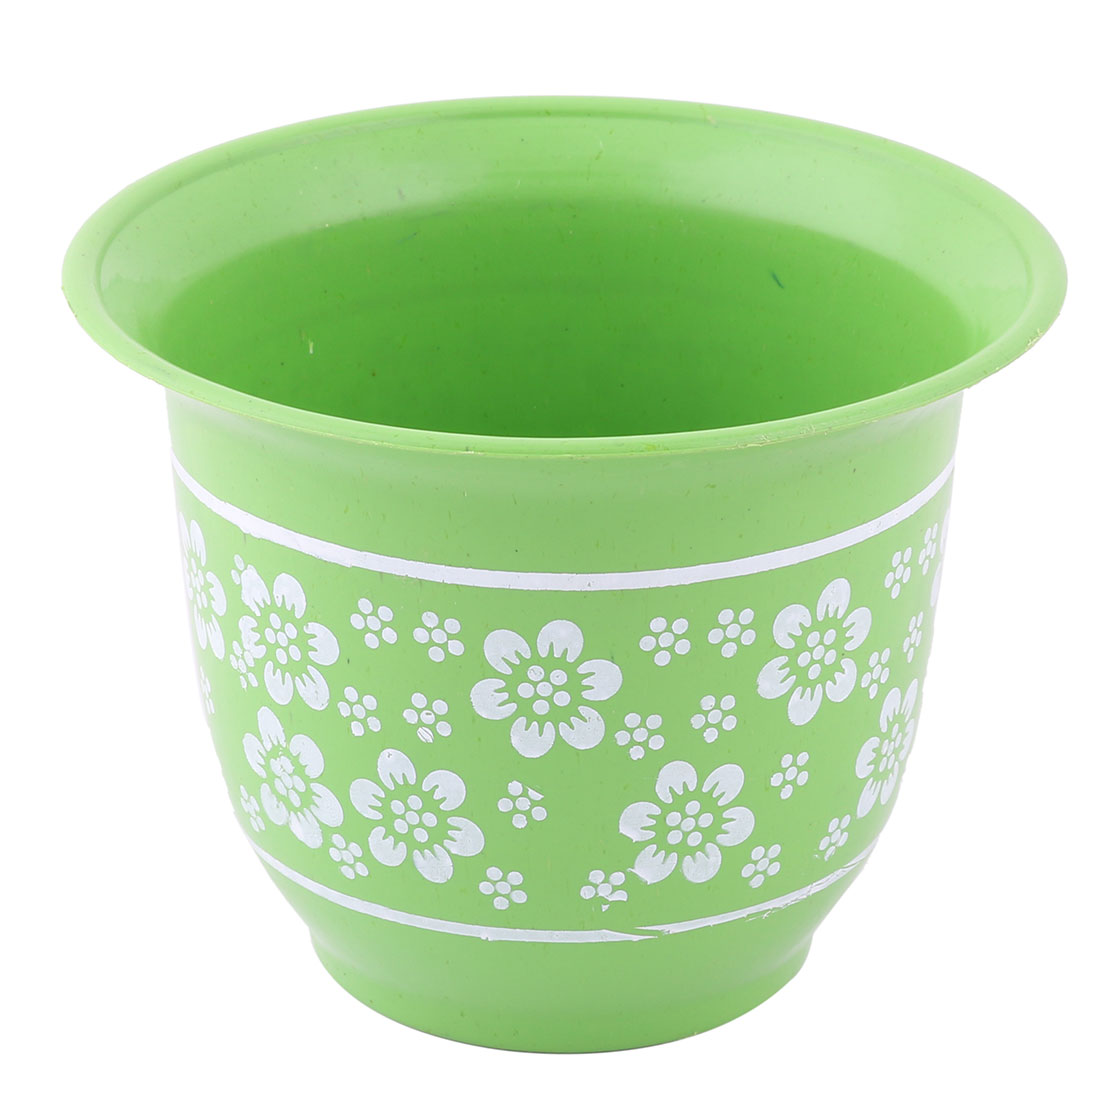 Party Decor Plastic Flower Pattern Round Plant Cactus Pot Holder Green 14cm Dia